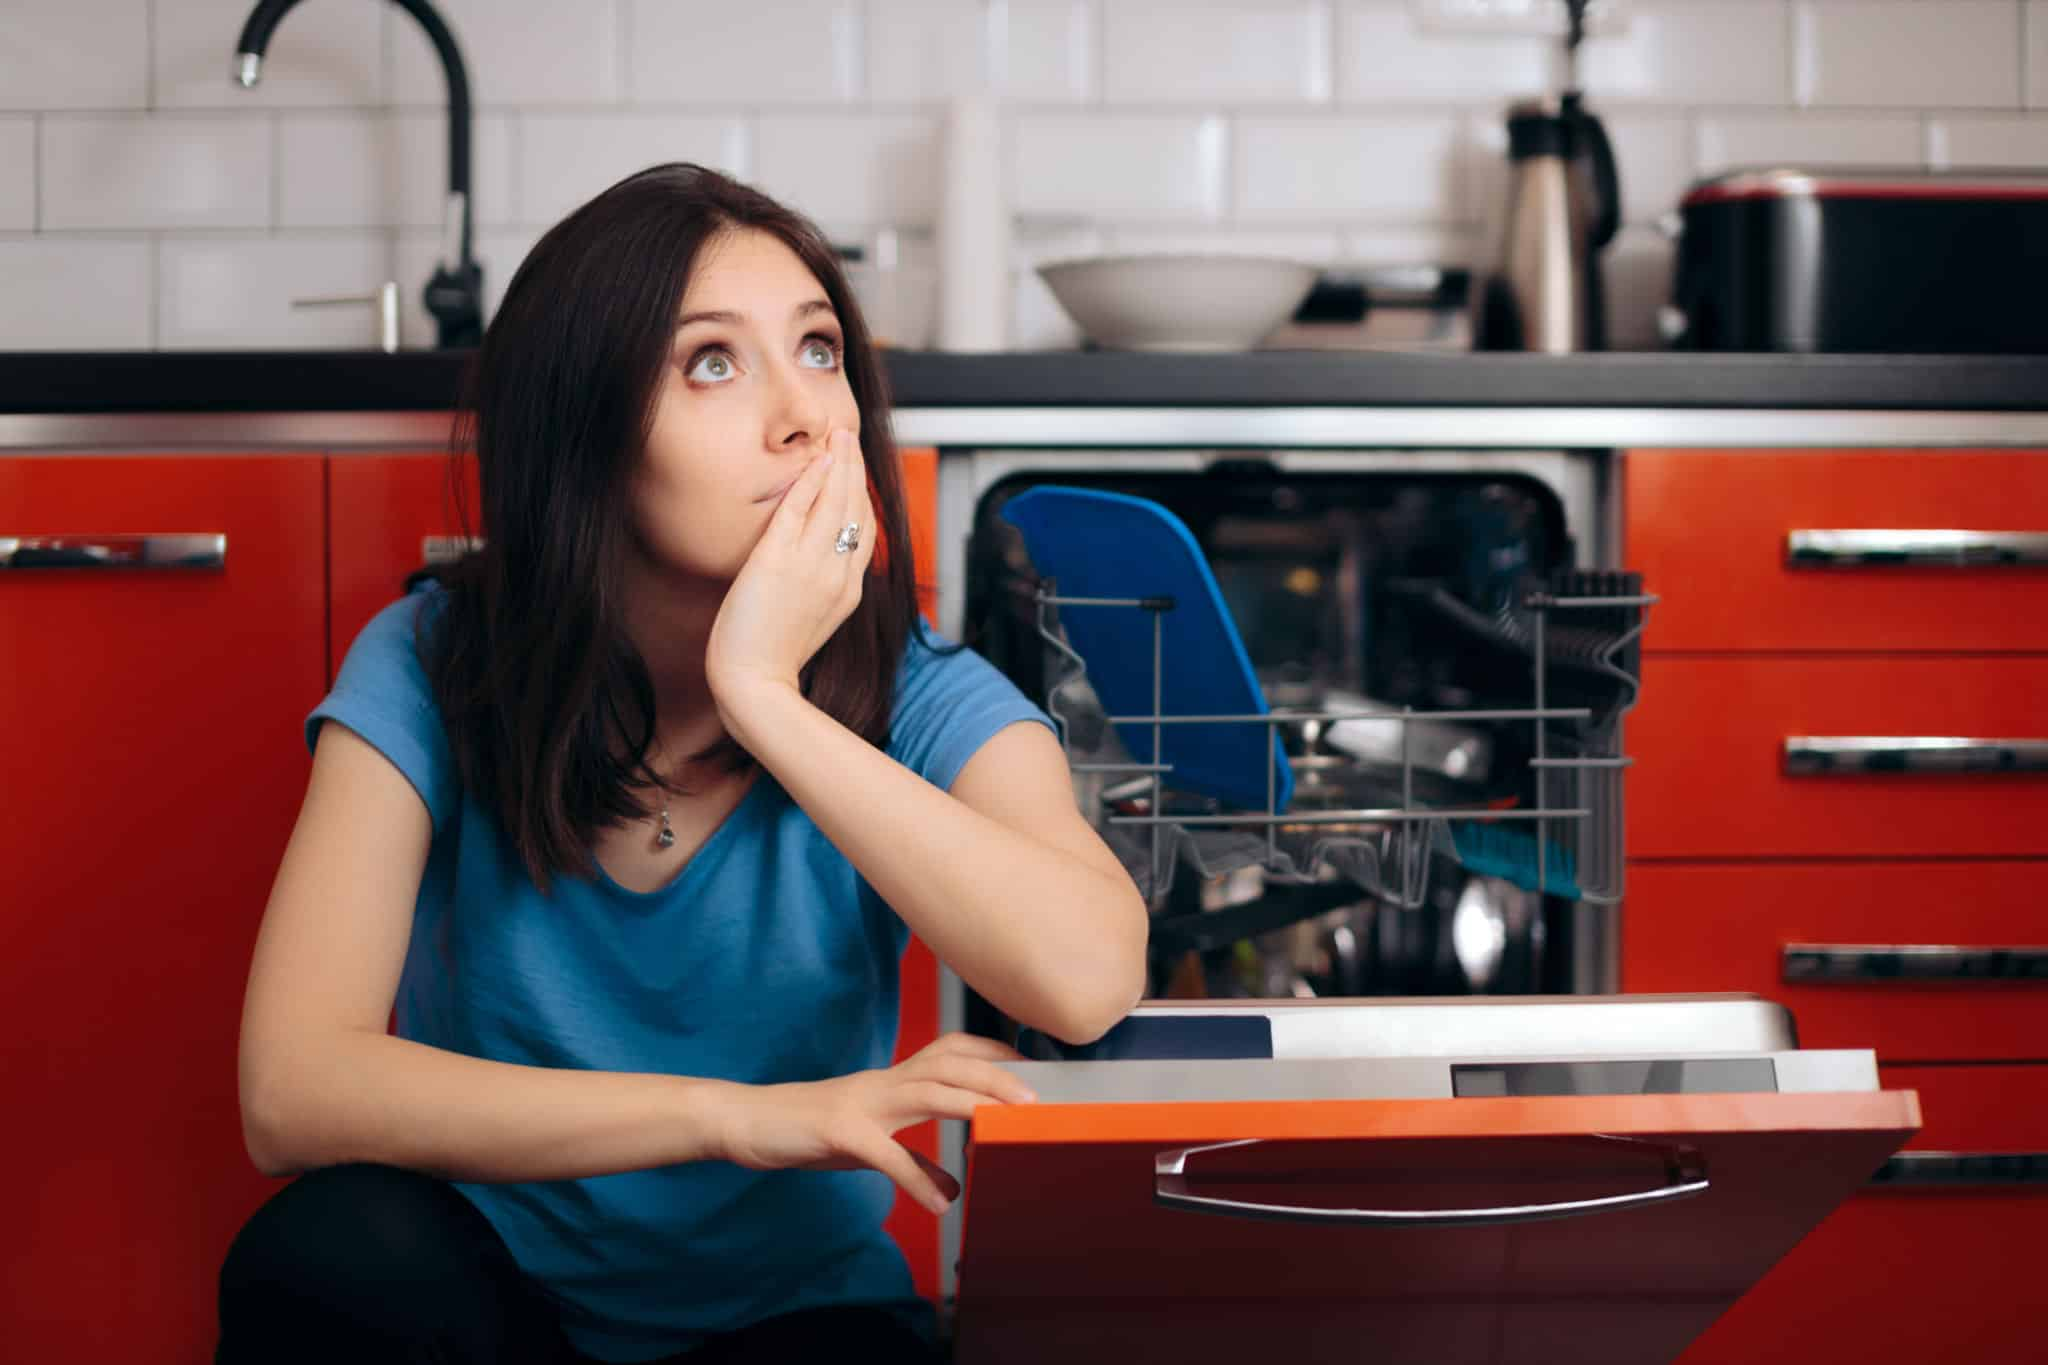 My Dishwasher not draining